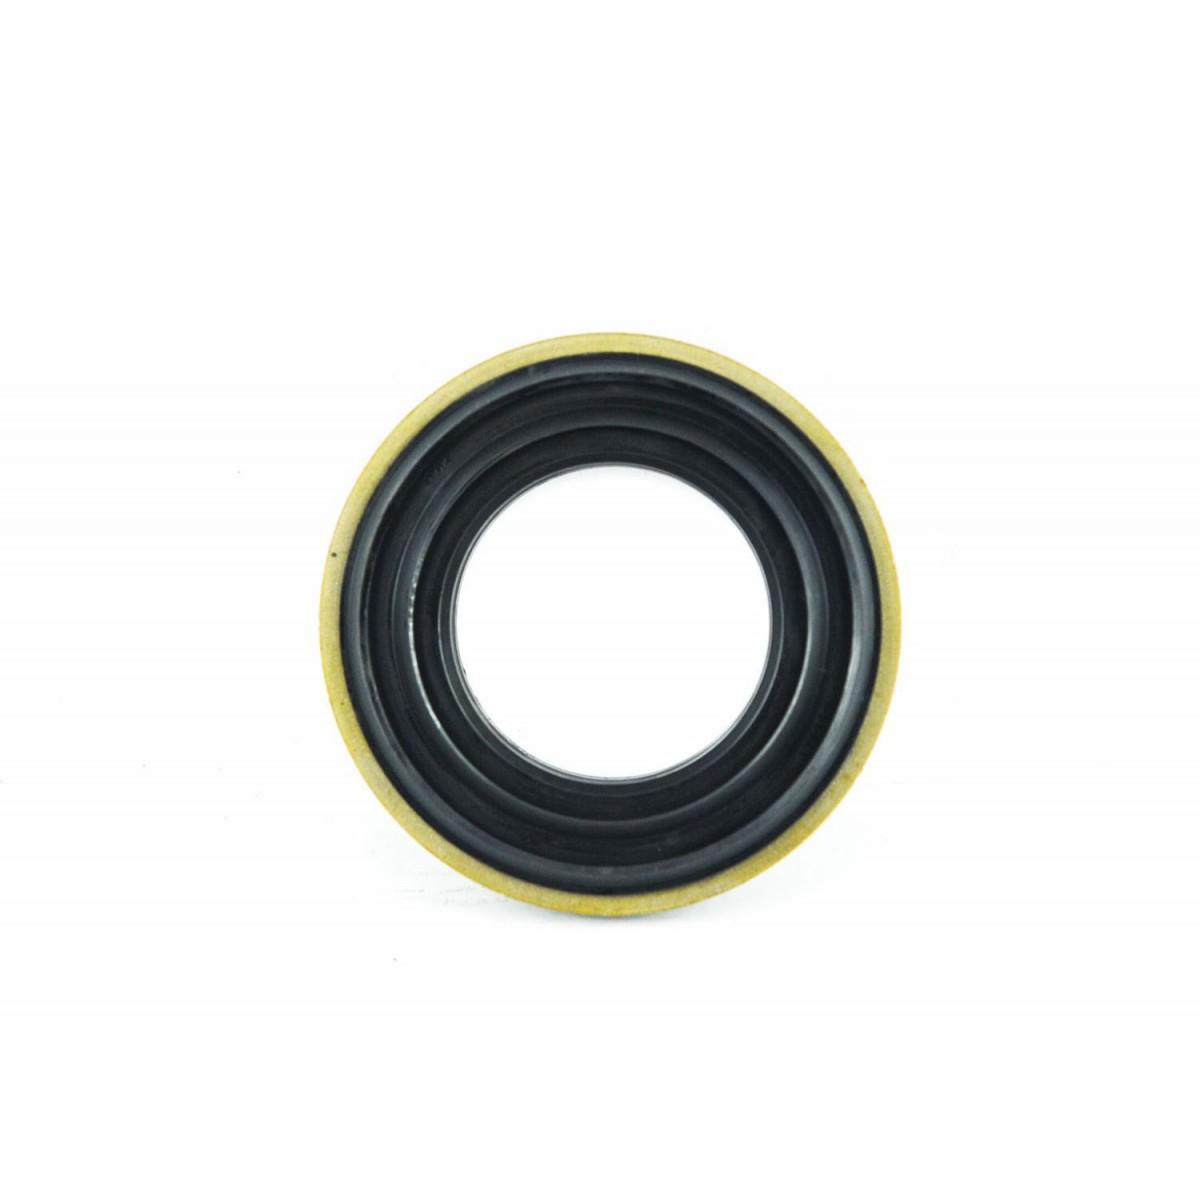 Hinterachskassette Dichtstoff 55-92-15/26 AQ3078E